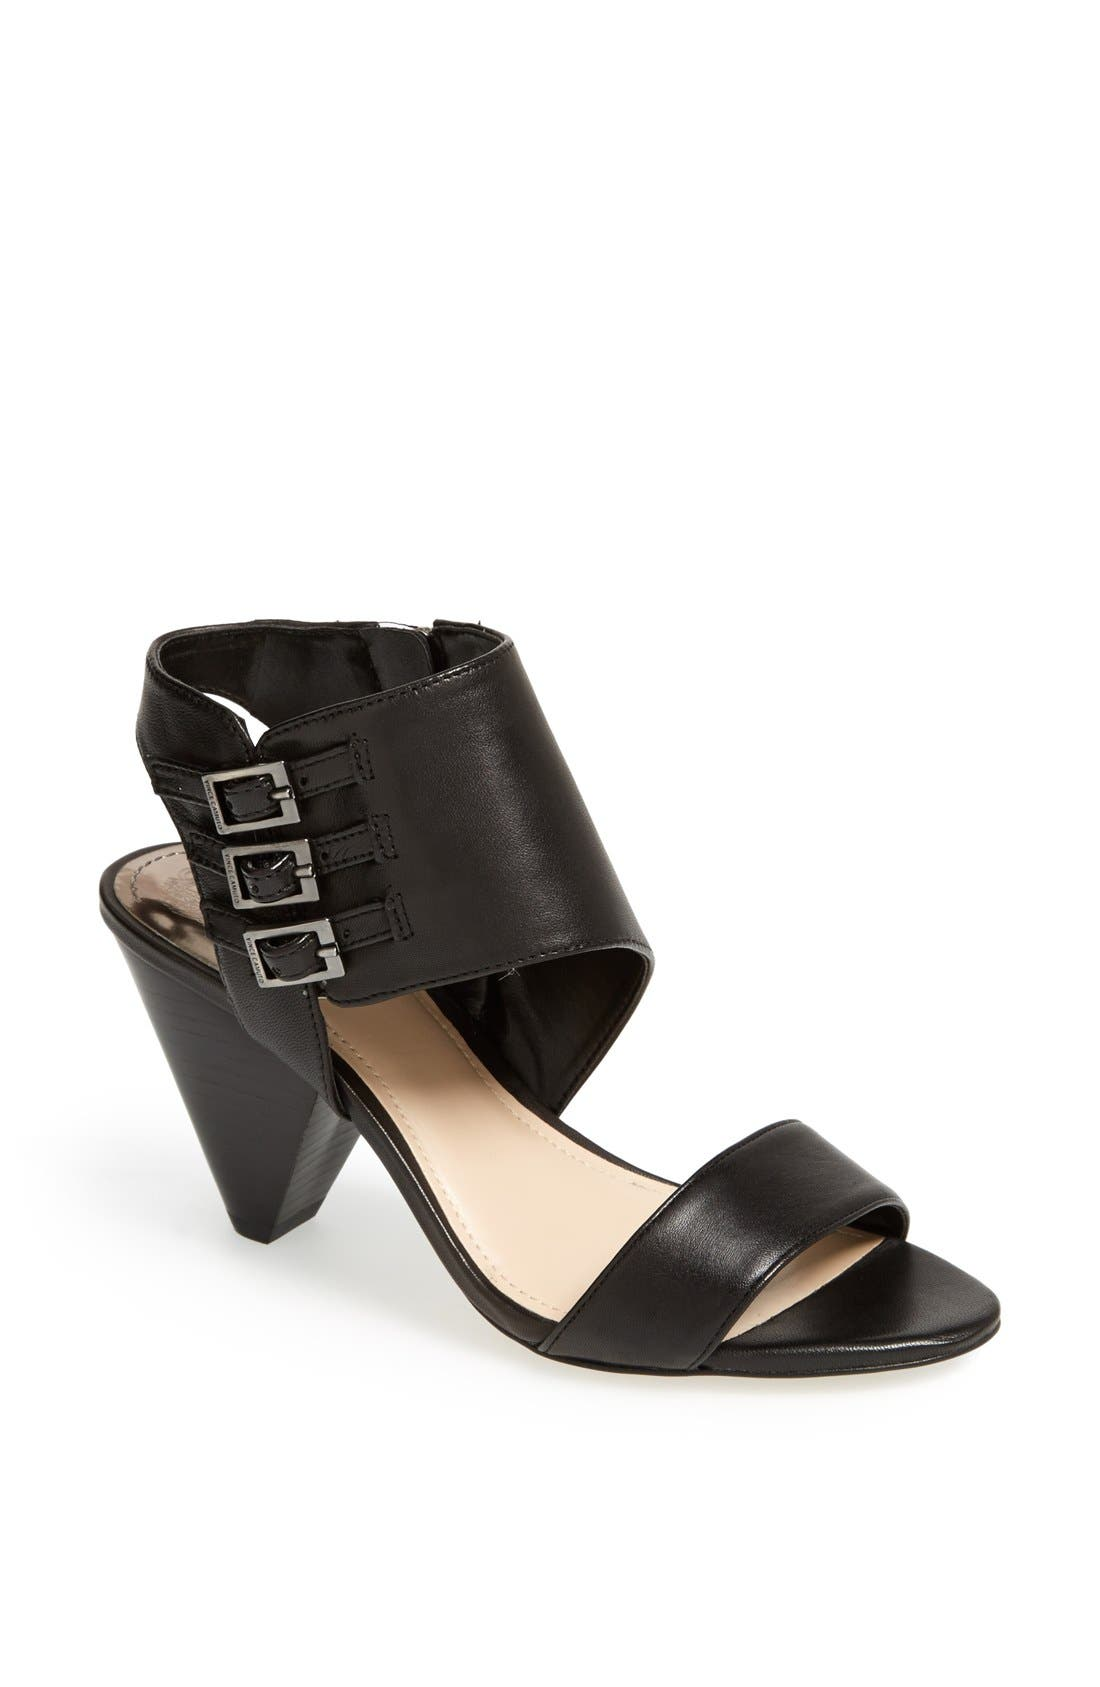 Alternate Image 1 Selected - Vince Camuto 'Edrika' Sandal